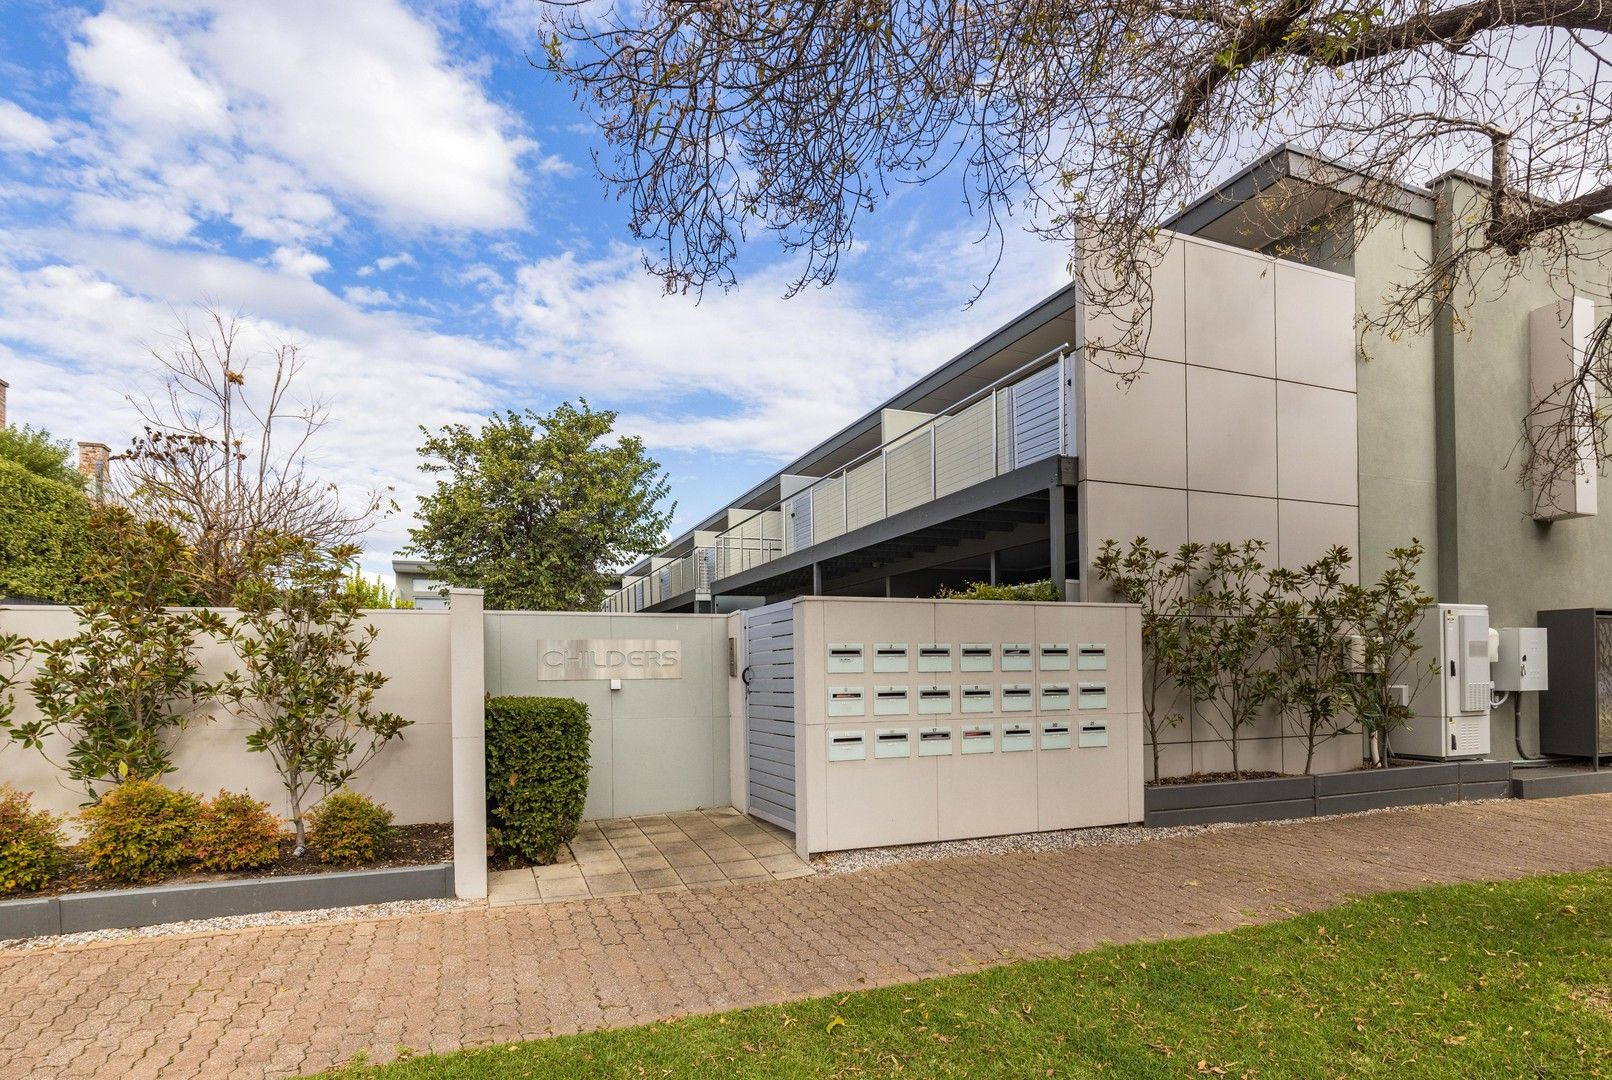 21/61 Childers  Street, North Adelaide SA 5006, Image 0